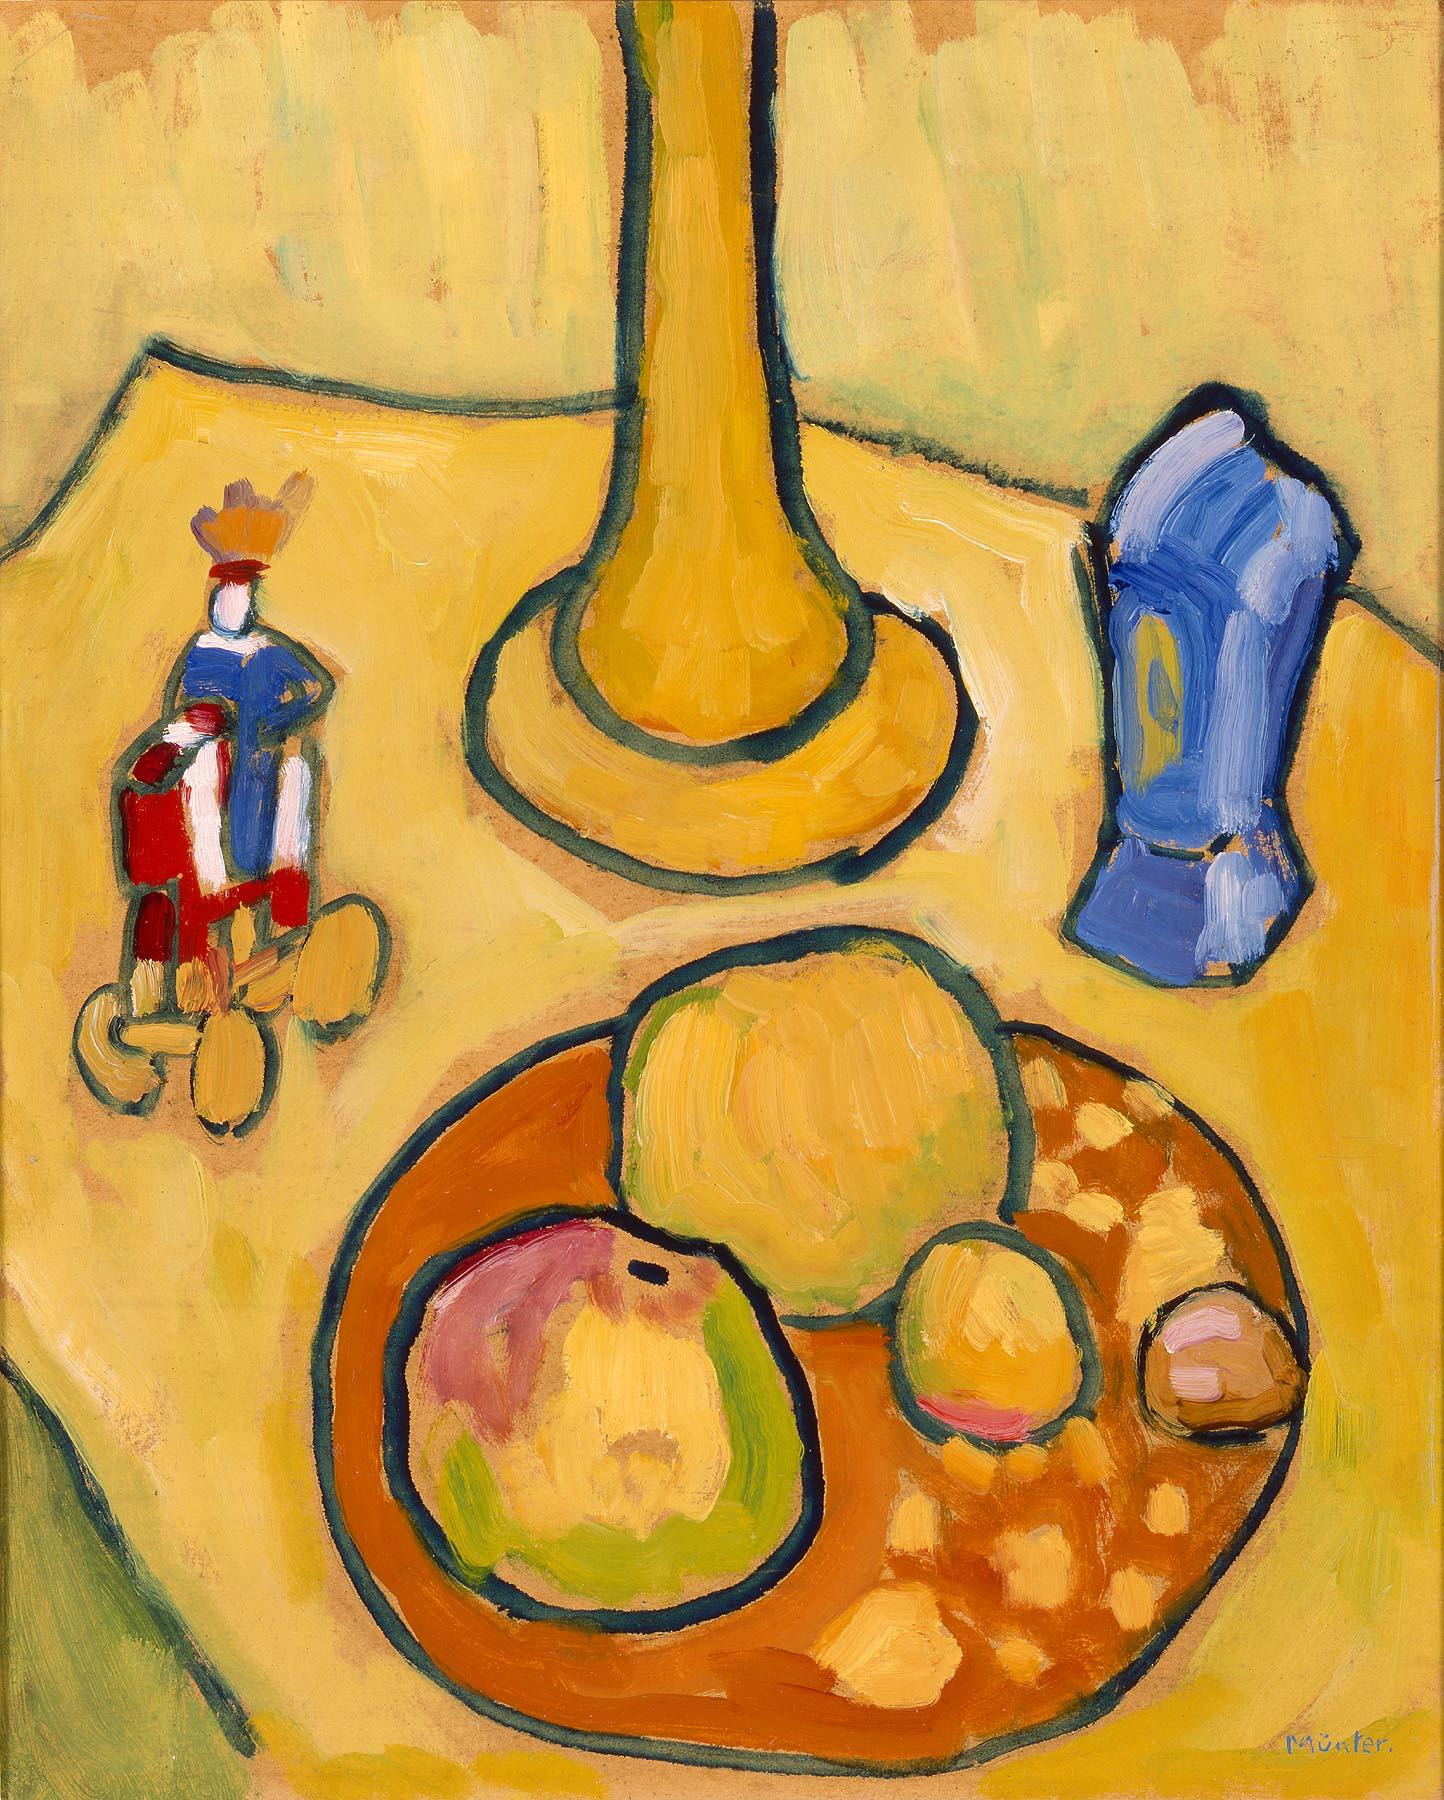 Gabriele Münter (German, 1877-1962).  Yellow Still Life.  1909.  Oil on cardboard.  Milwaukee Art Museum, gift of Mrs. Harry Lynde Bradley, M1975.156. Photo credit: Larry Sanders.